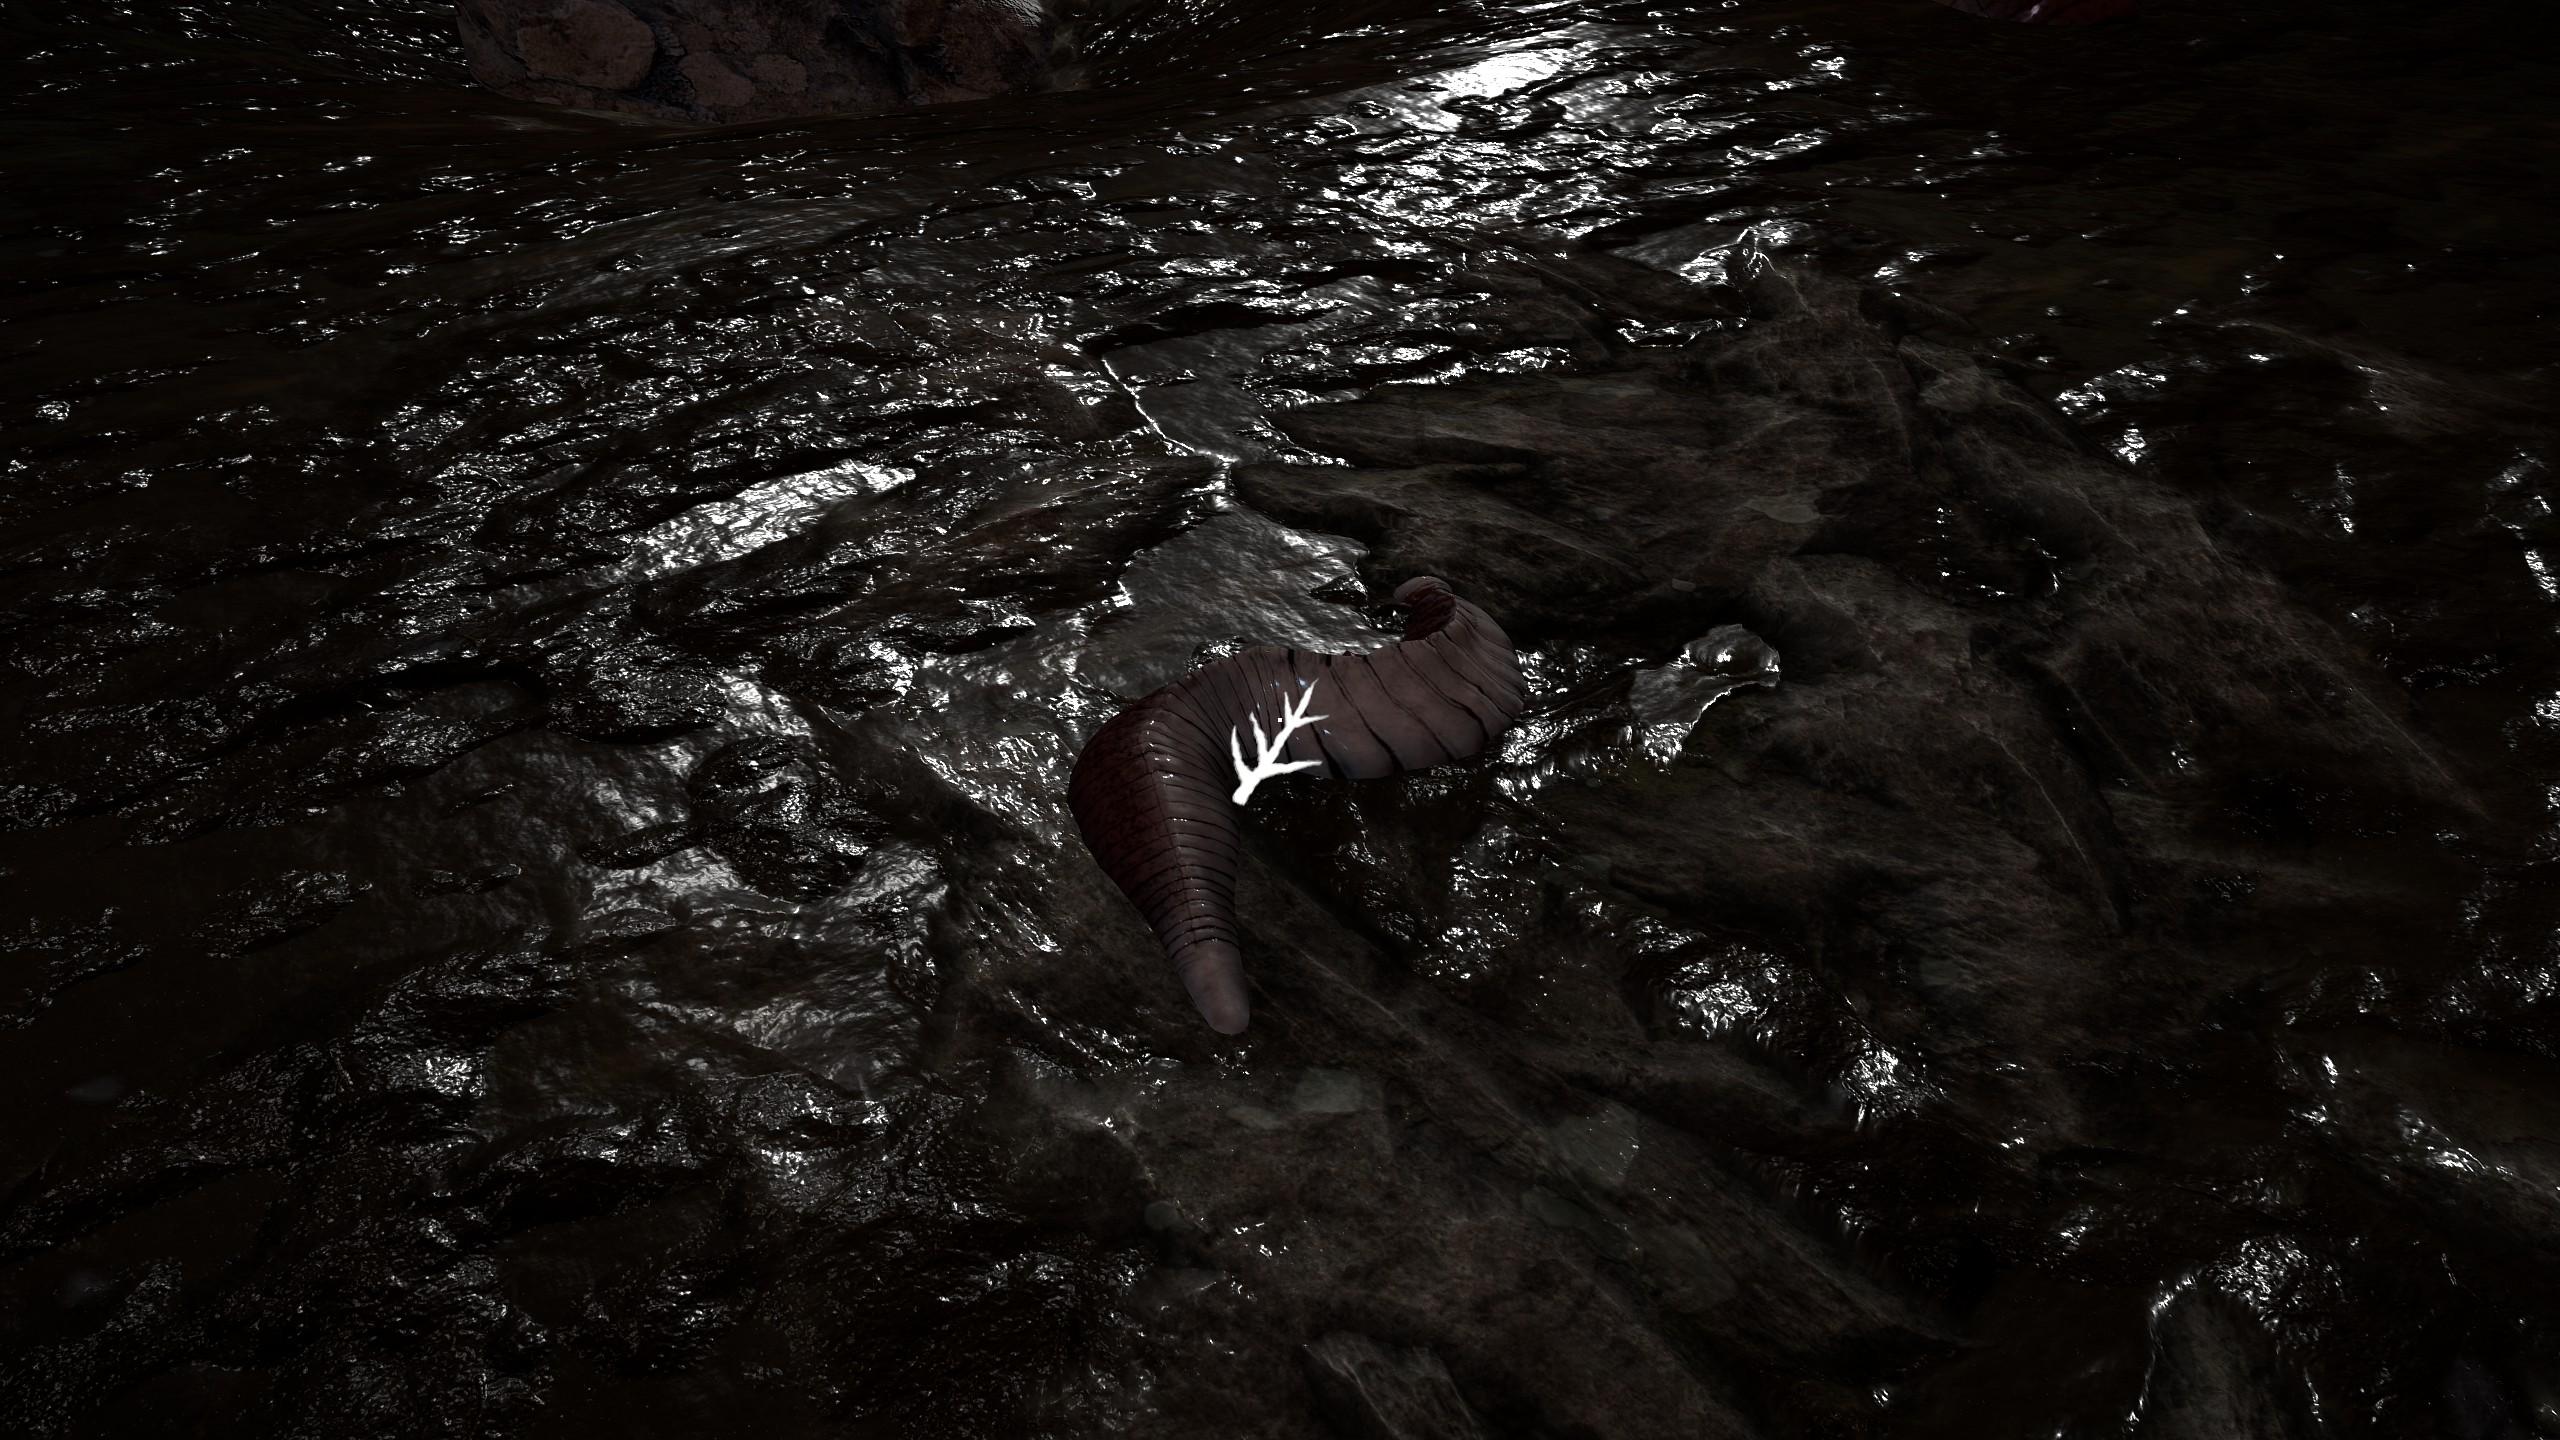 Dagon - Hints for All Hidden Trivia in Game Tips - The Horrors of the Ocean - BA6DA10